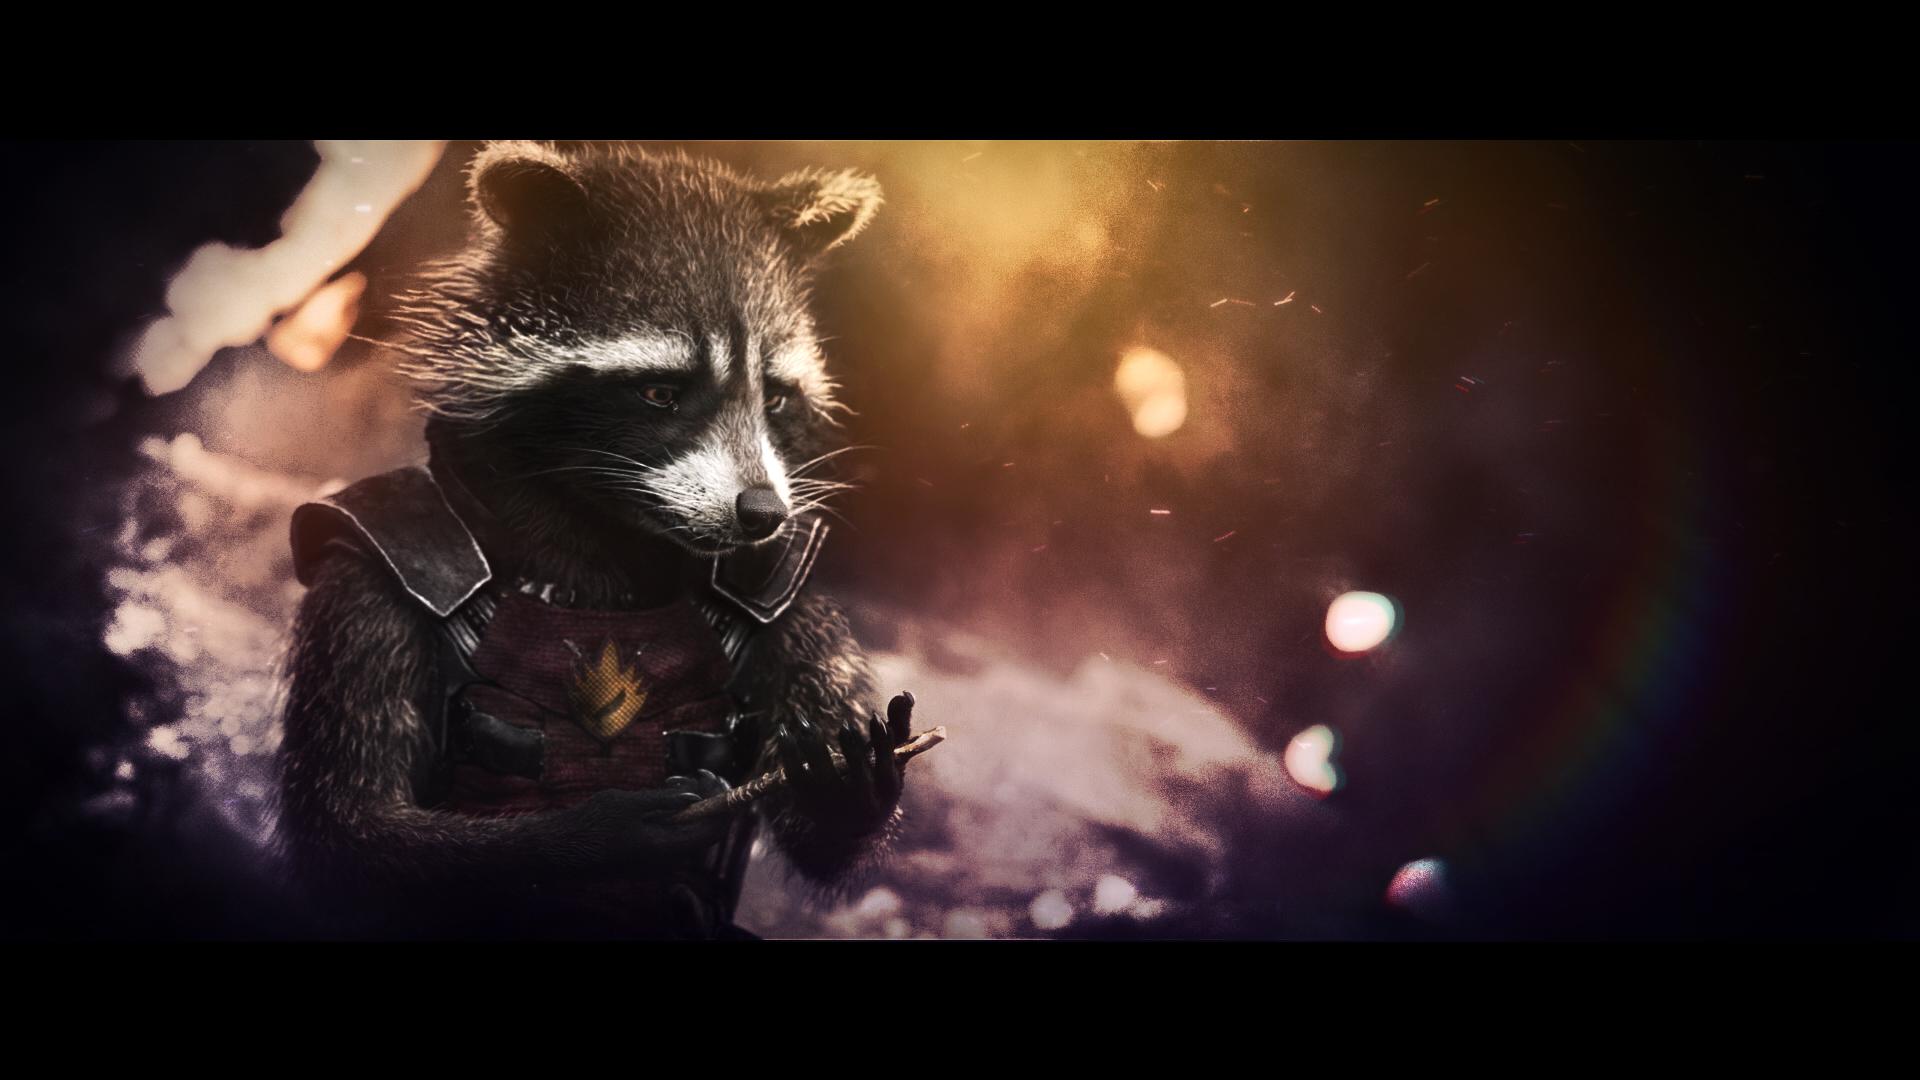 Rocket Raccoon Wallpaper 8 By BiigM